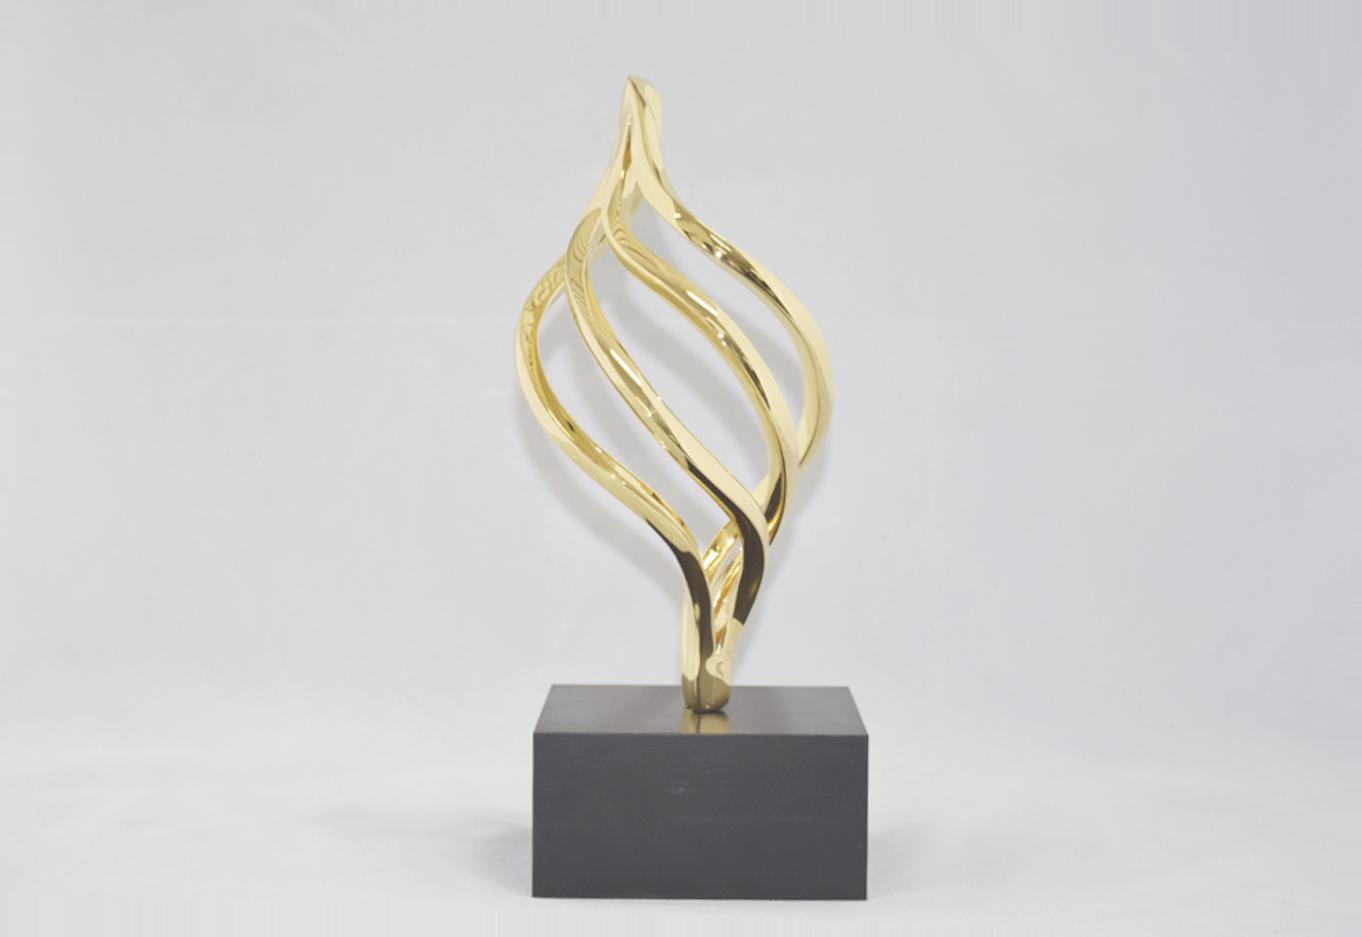 VetPowered Custom Awards & Trophies